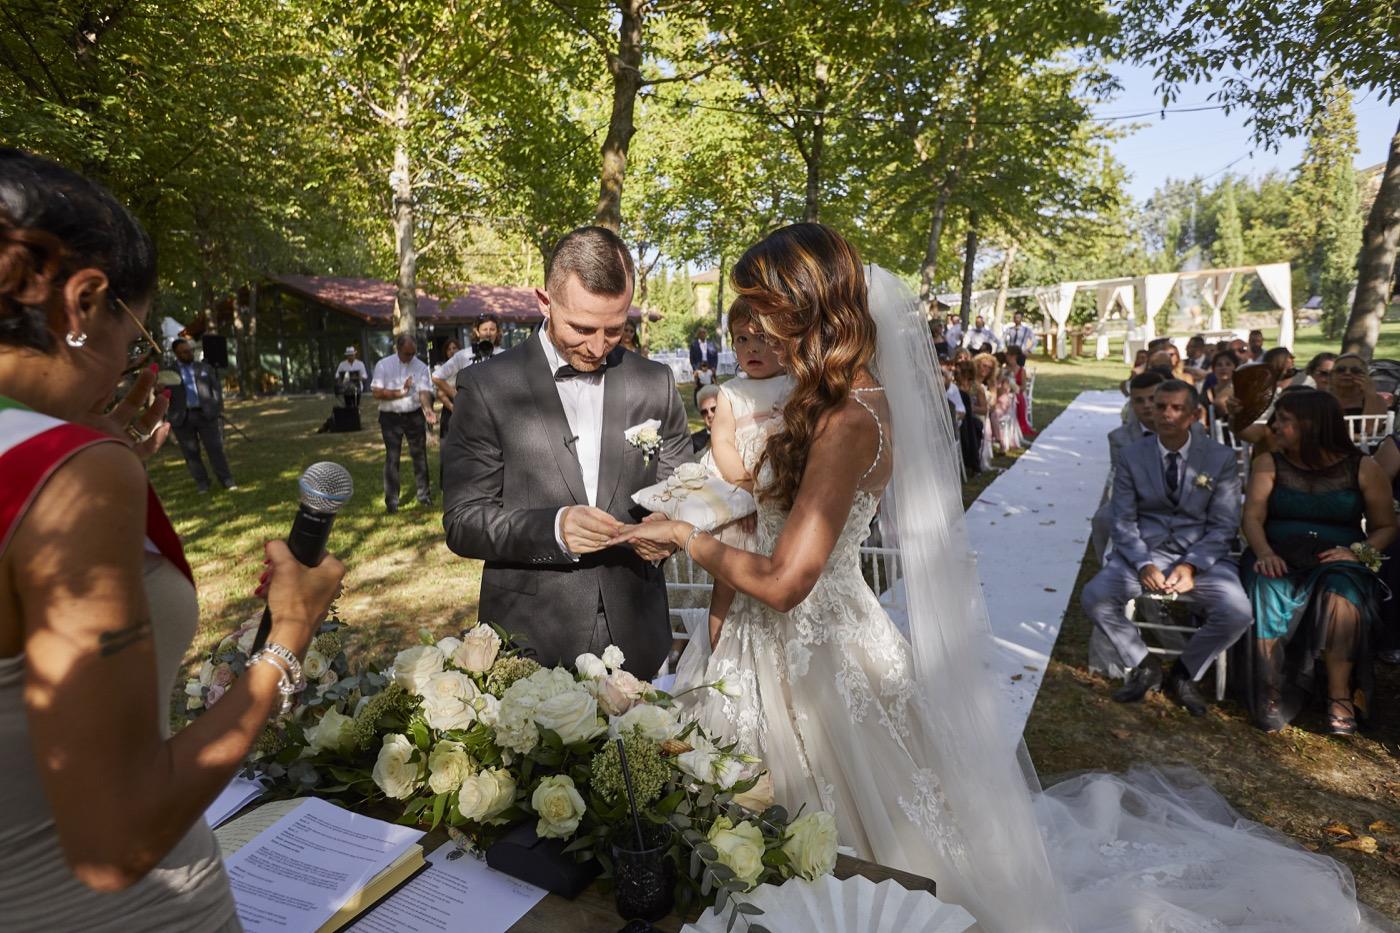 Claudio-Coppola-wedding-photographer-la-scuderia-eventi-preparativi-la-rosetta-perugia-58